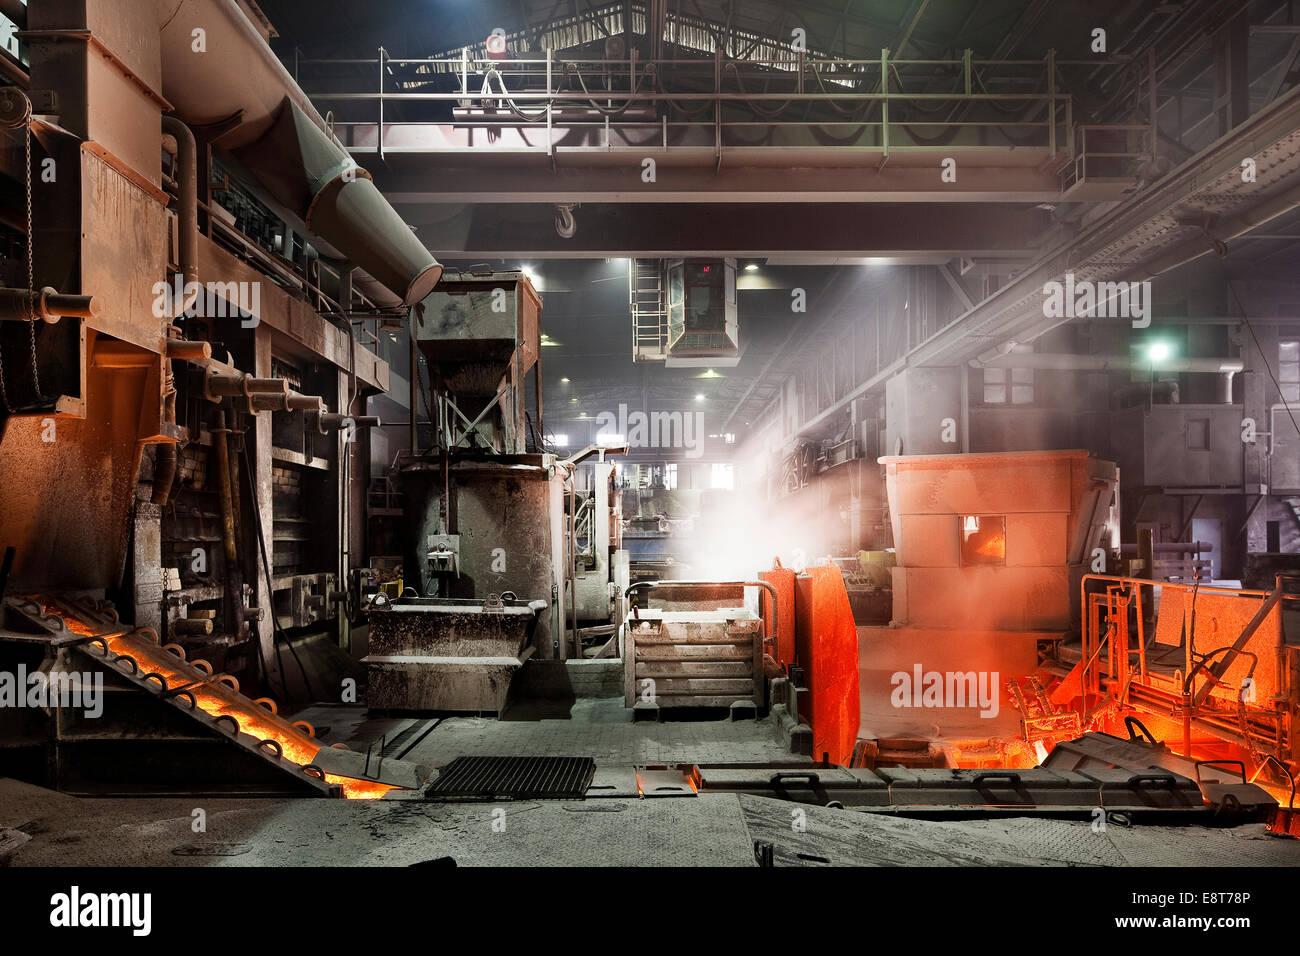 Copper smelter, industrial plant, Brixlegg, North Tyrol, Austria - Stock Image